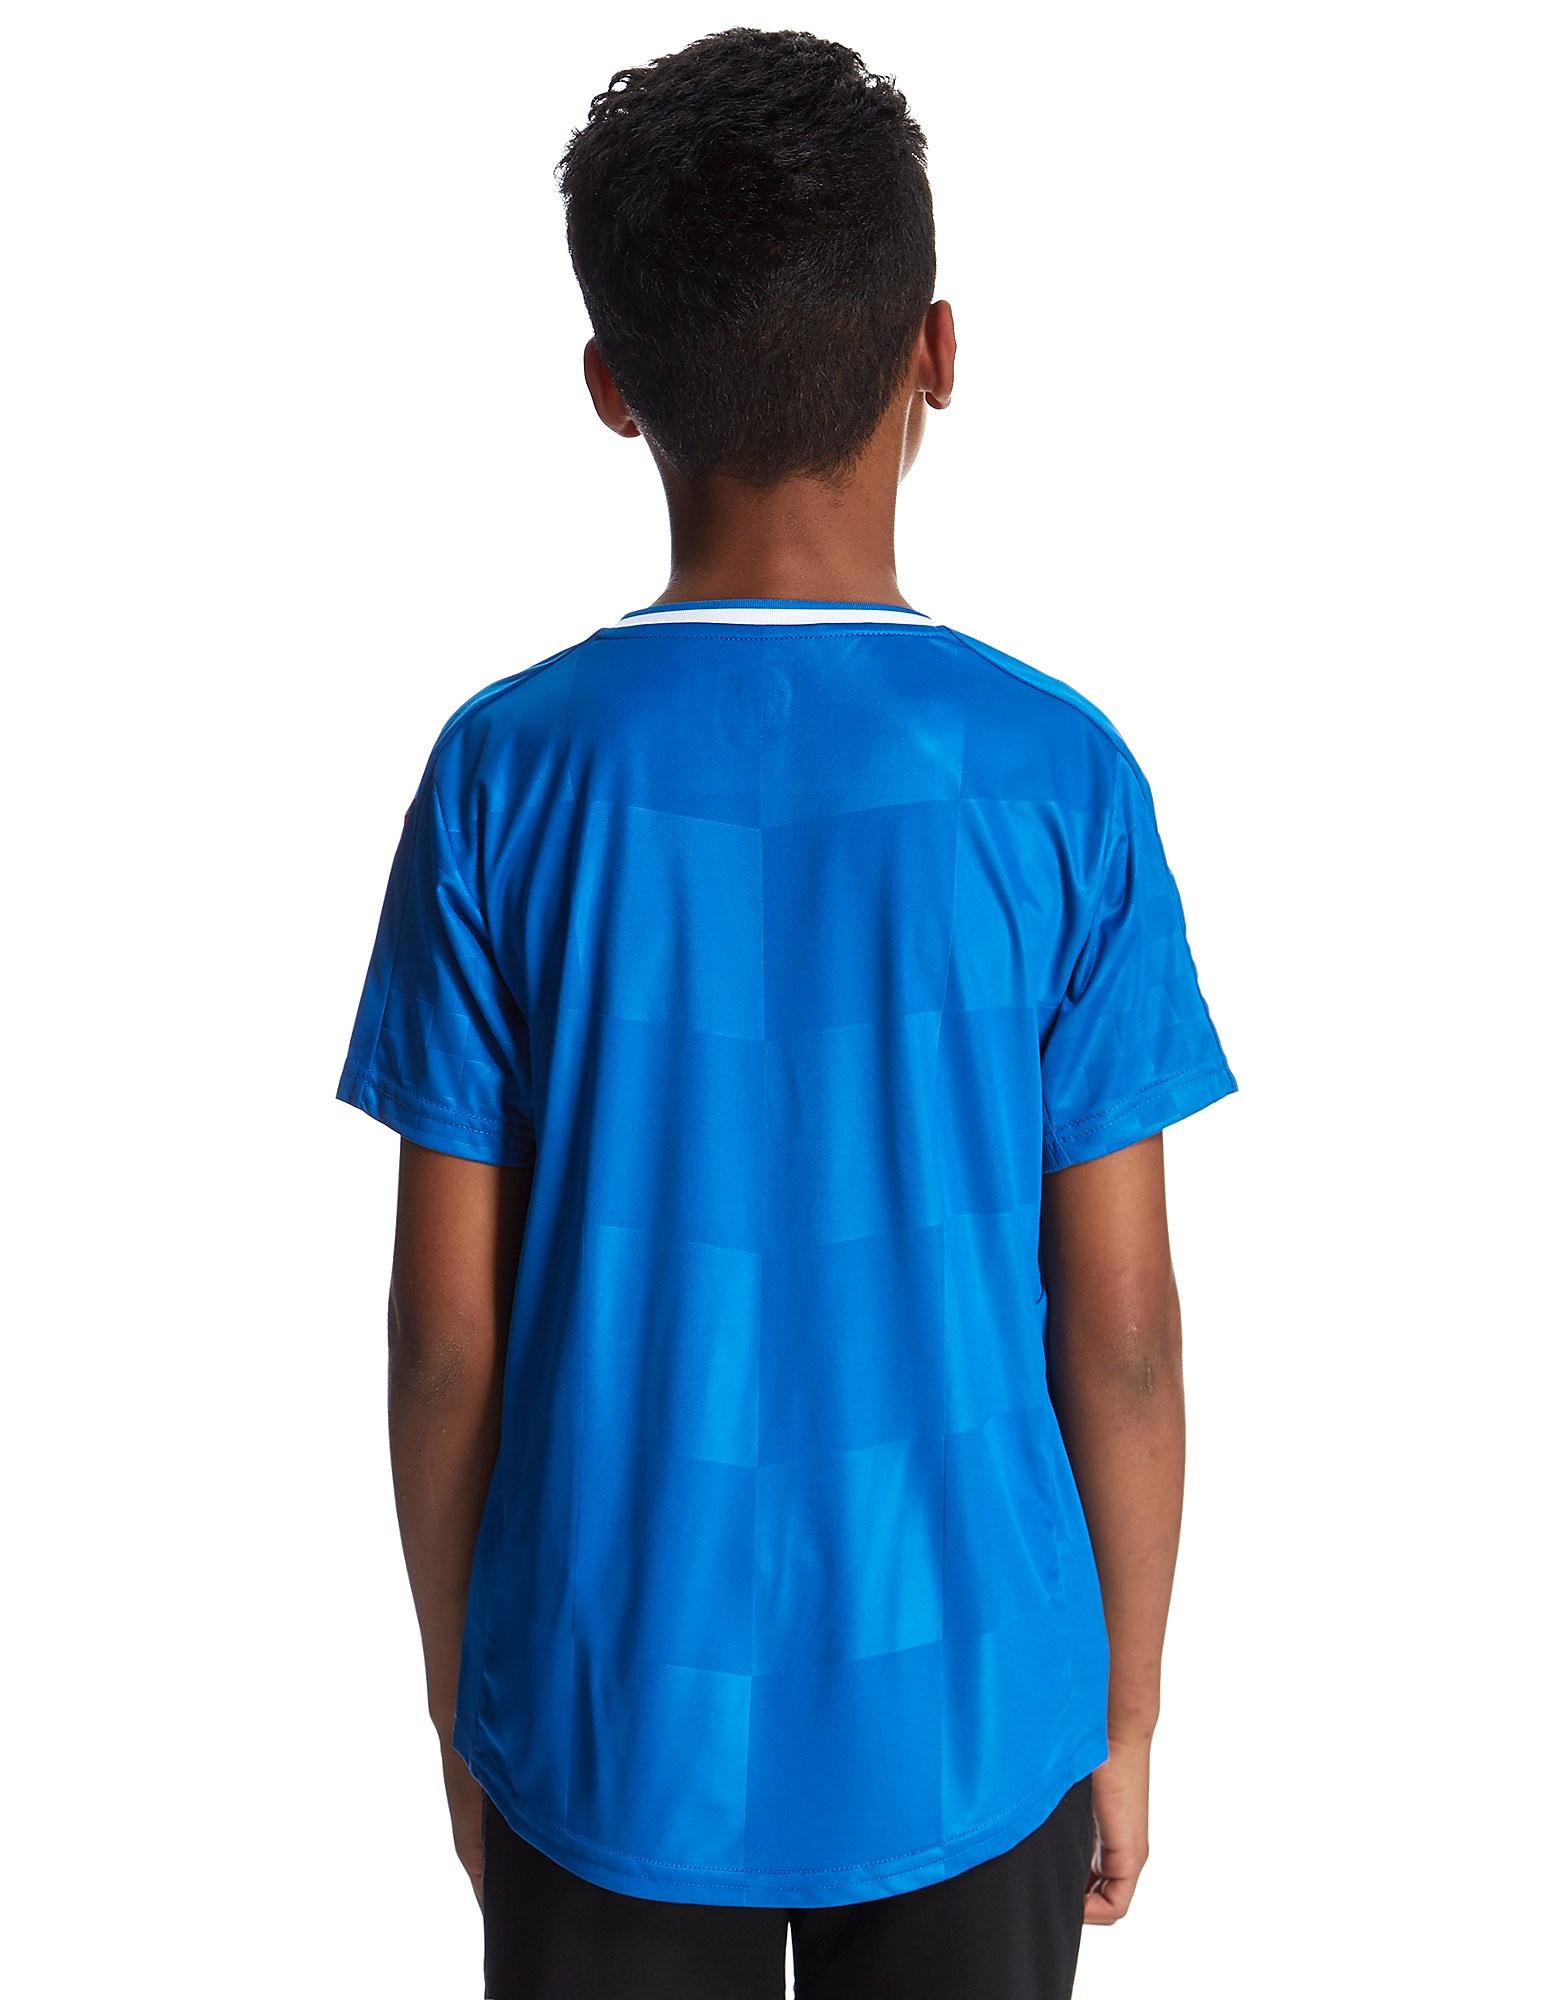 PUMA Rangers FC 2016/17 Home Shirt Junior